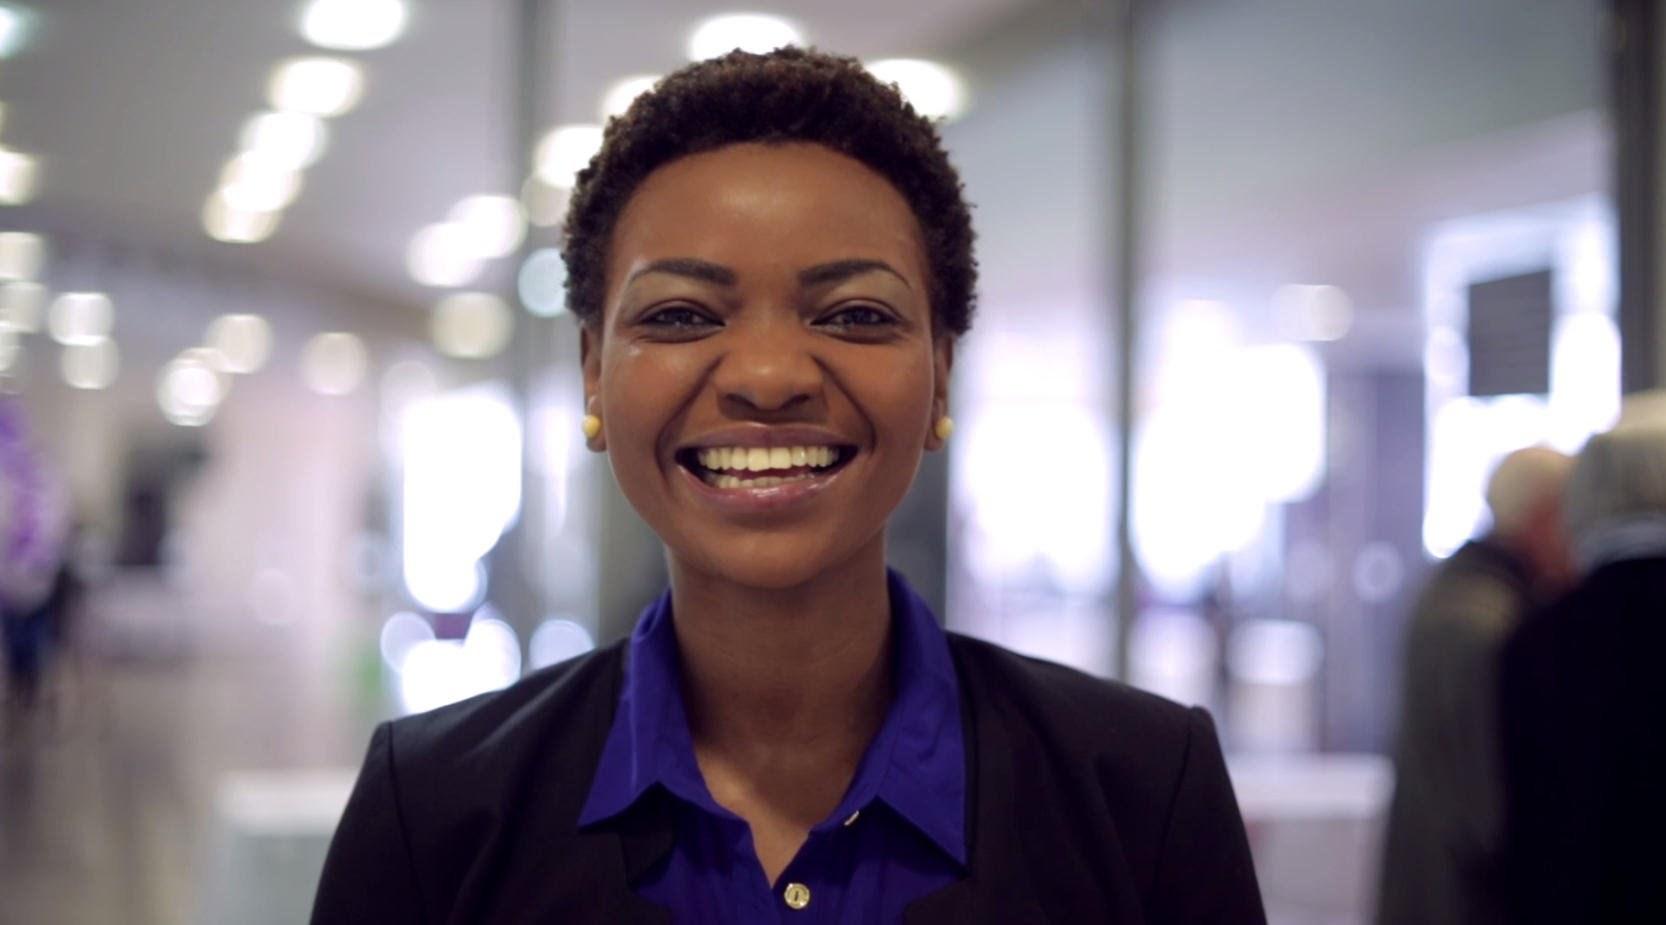 7 STEPS TO WINNING INTERNATIONAL SCHOLARSHIPS AS A NIGERIAN STUDENT